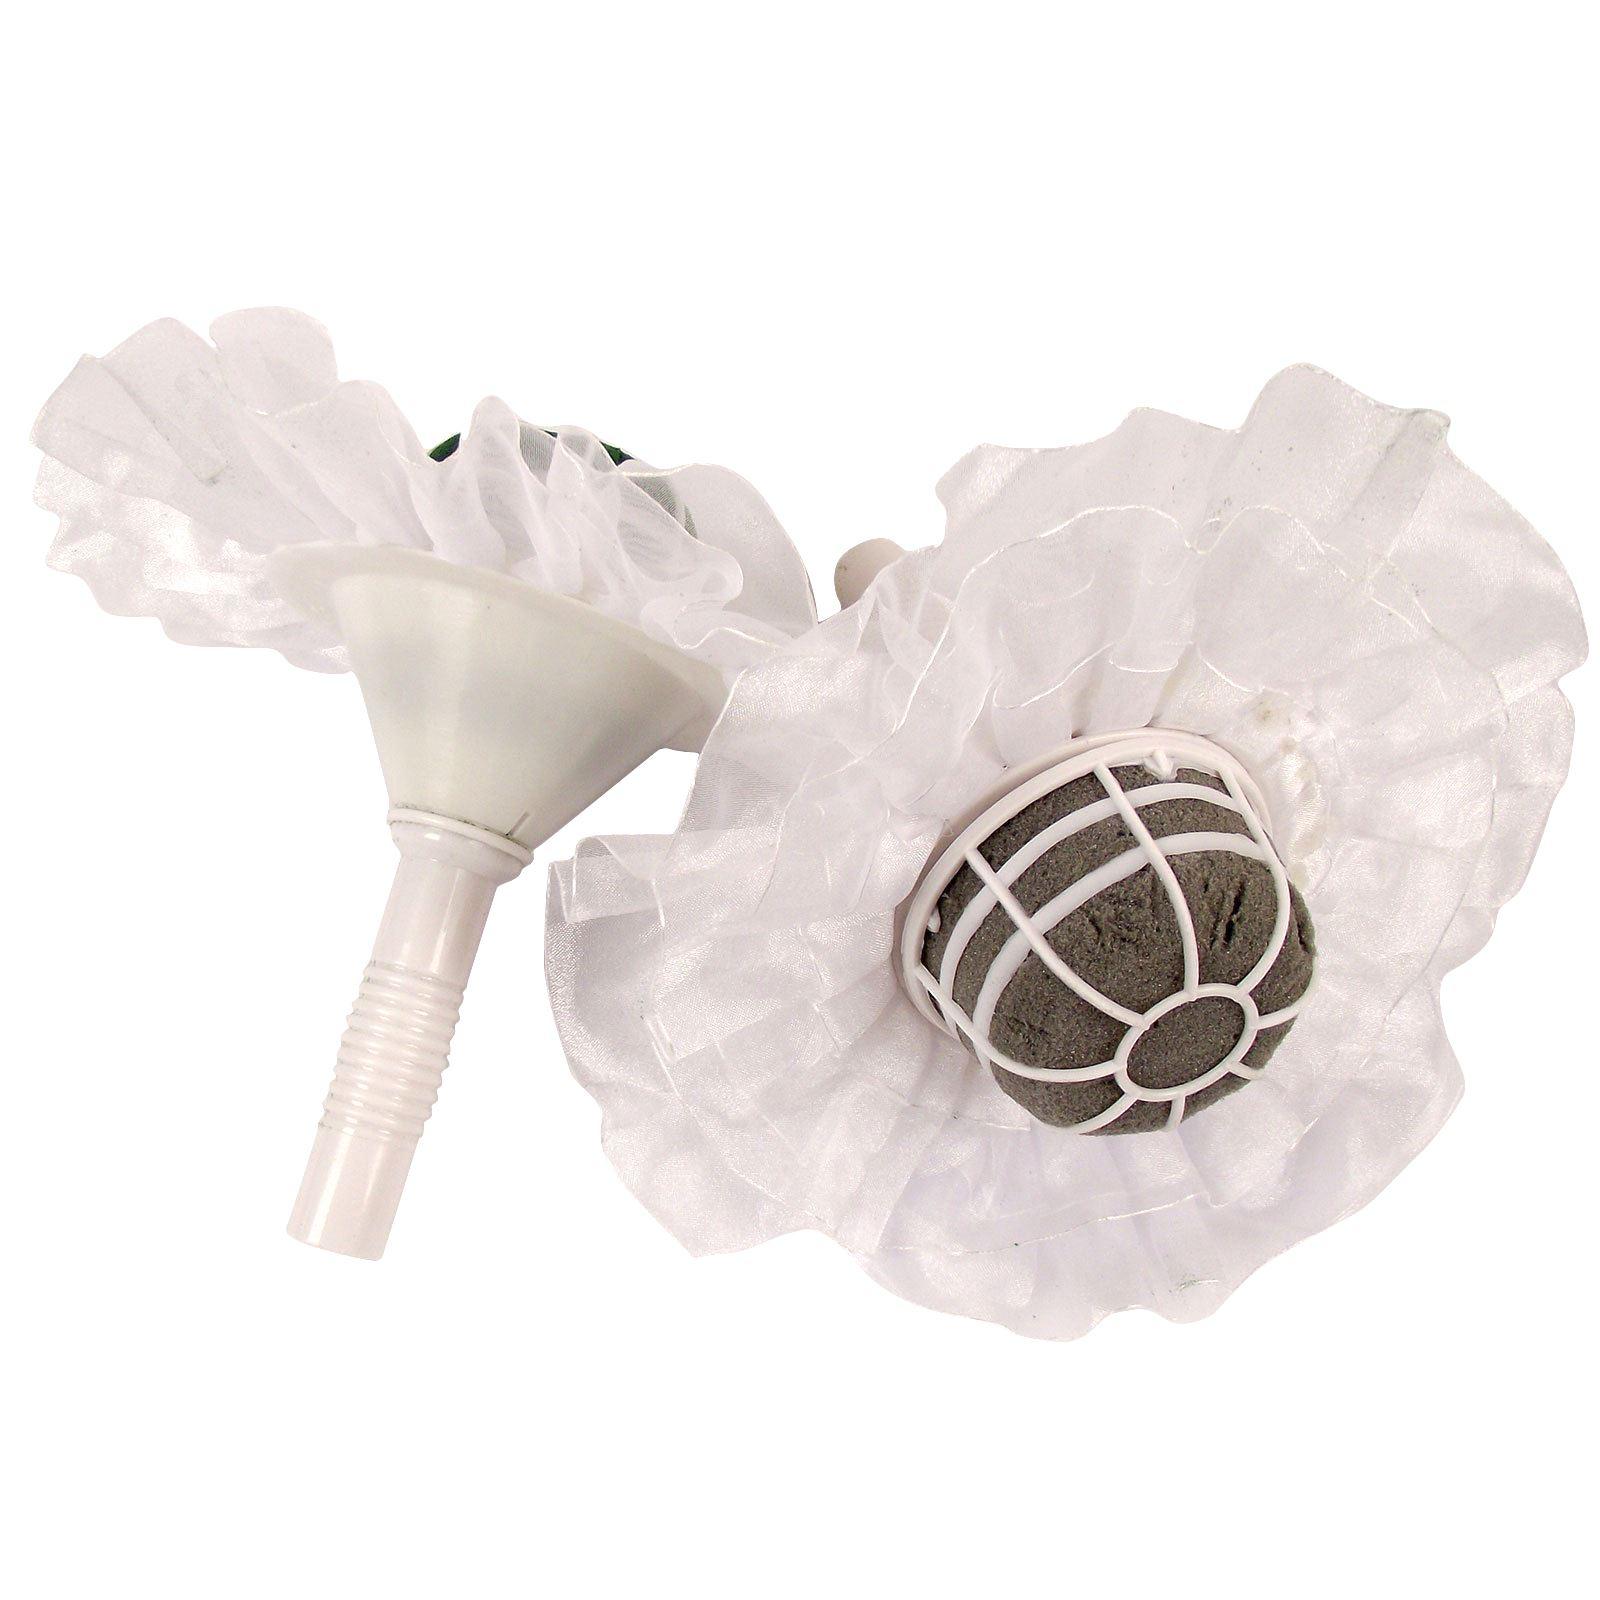 Foam bouquet holders with frills oasis wedding belle sec fresh picture 2 of 3 izmirmasajfo